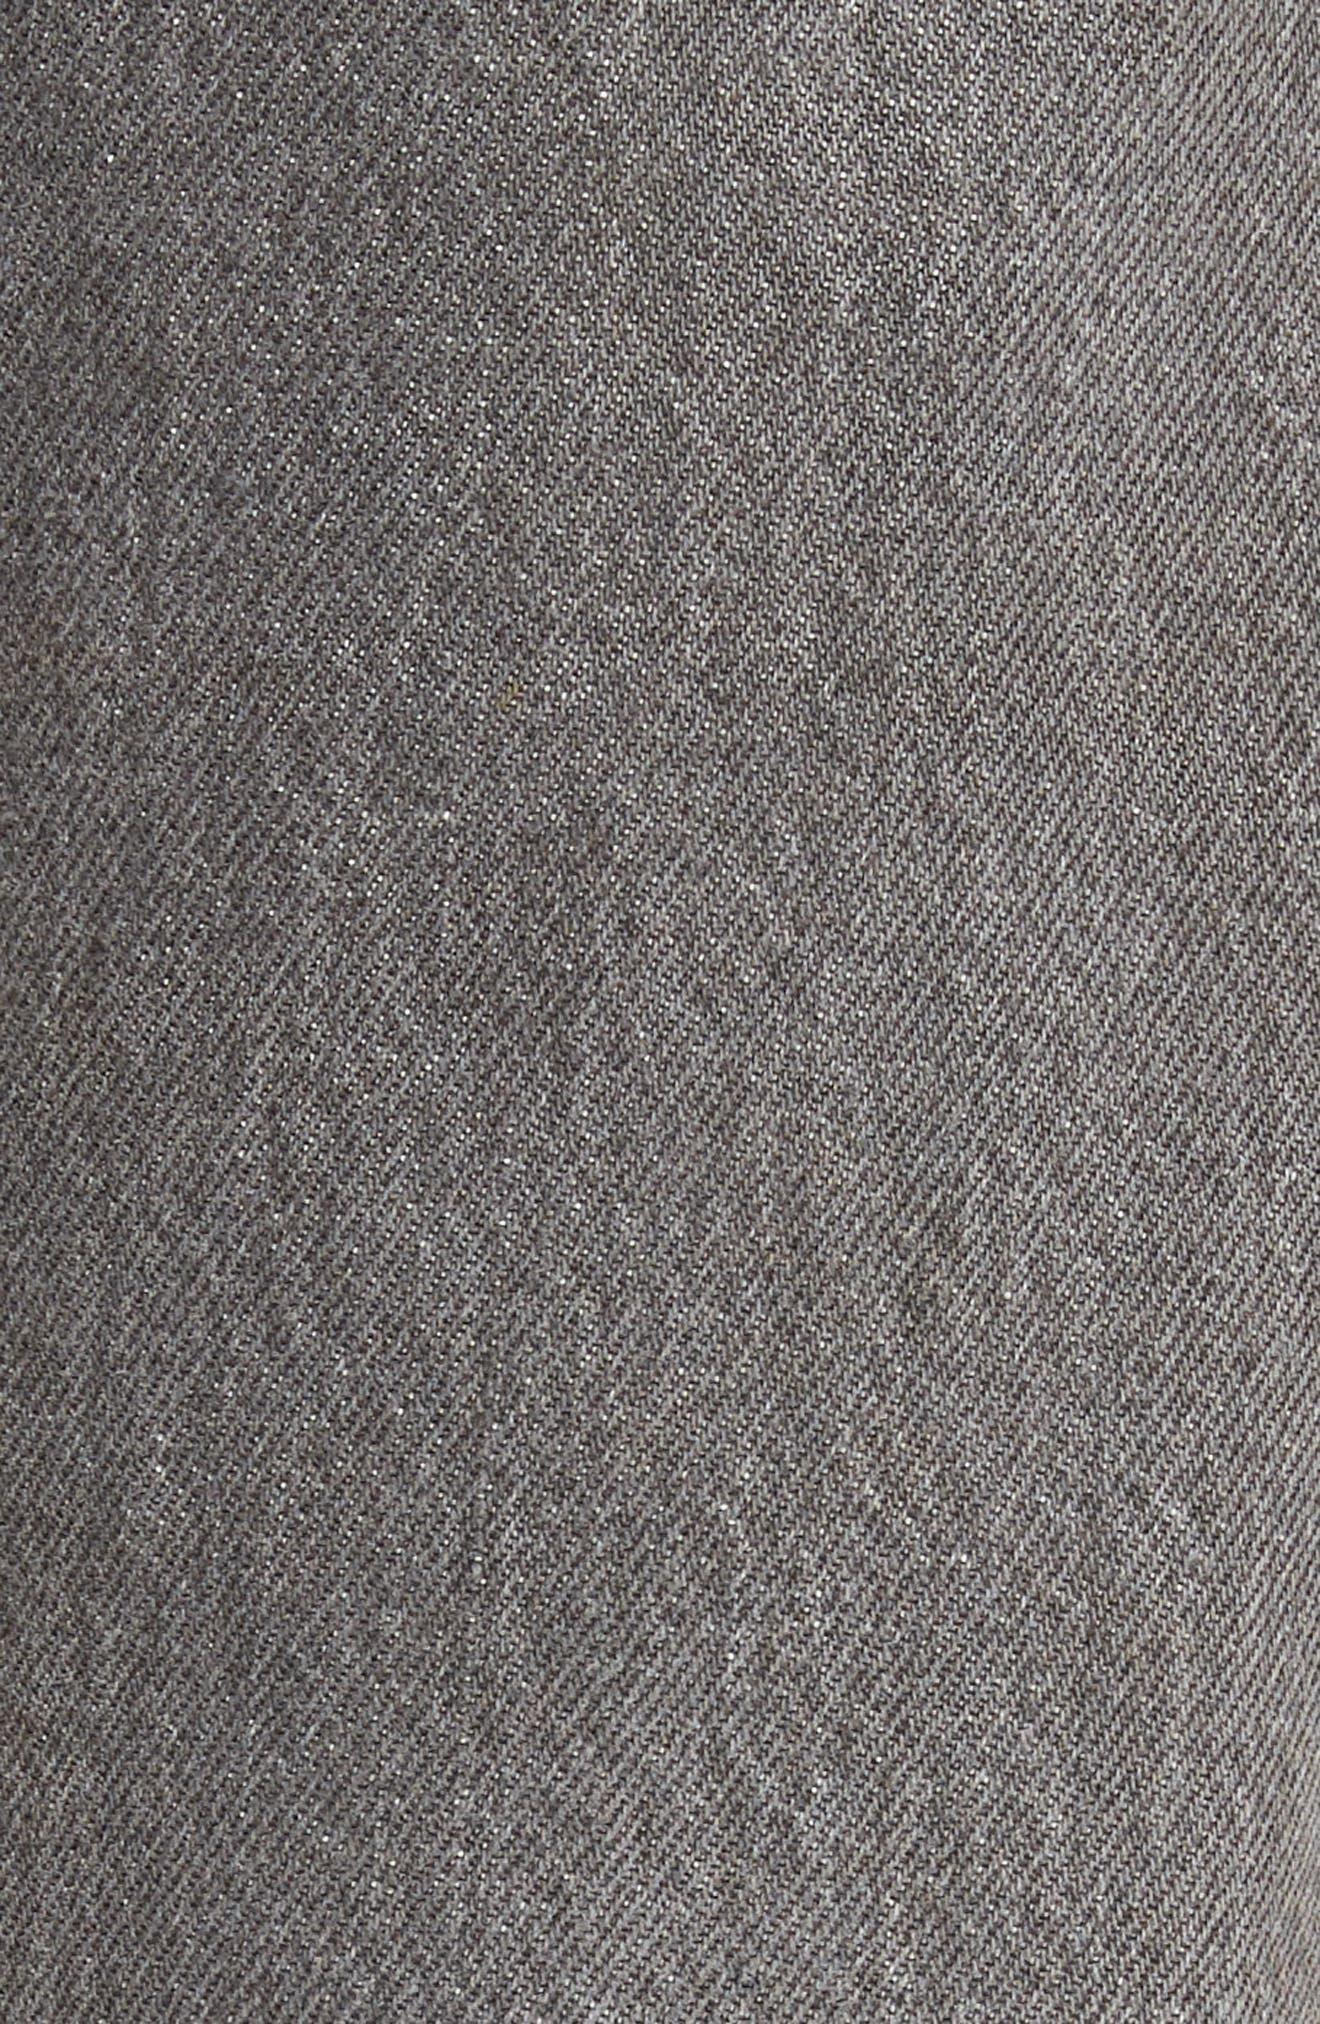 Authorized Vintage 501<sup>™</sup> Tapered Slim Fit Jeans,                             Alternate thumbnail 5, color,                             Av Black